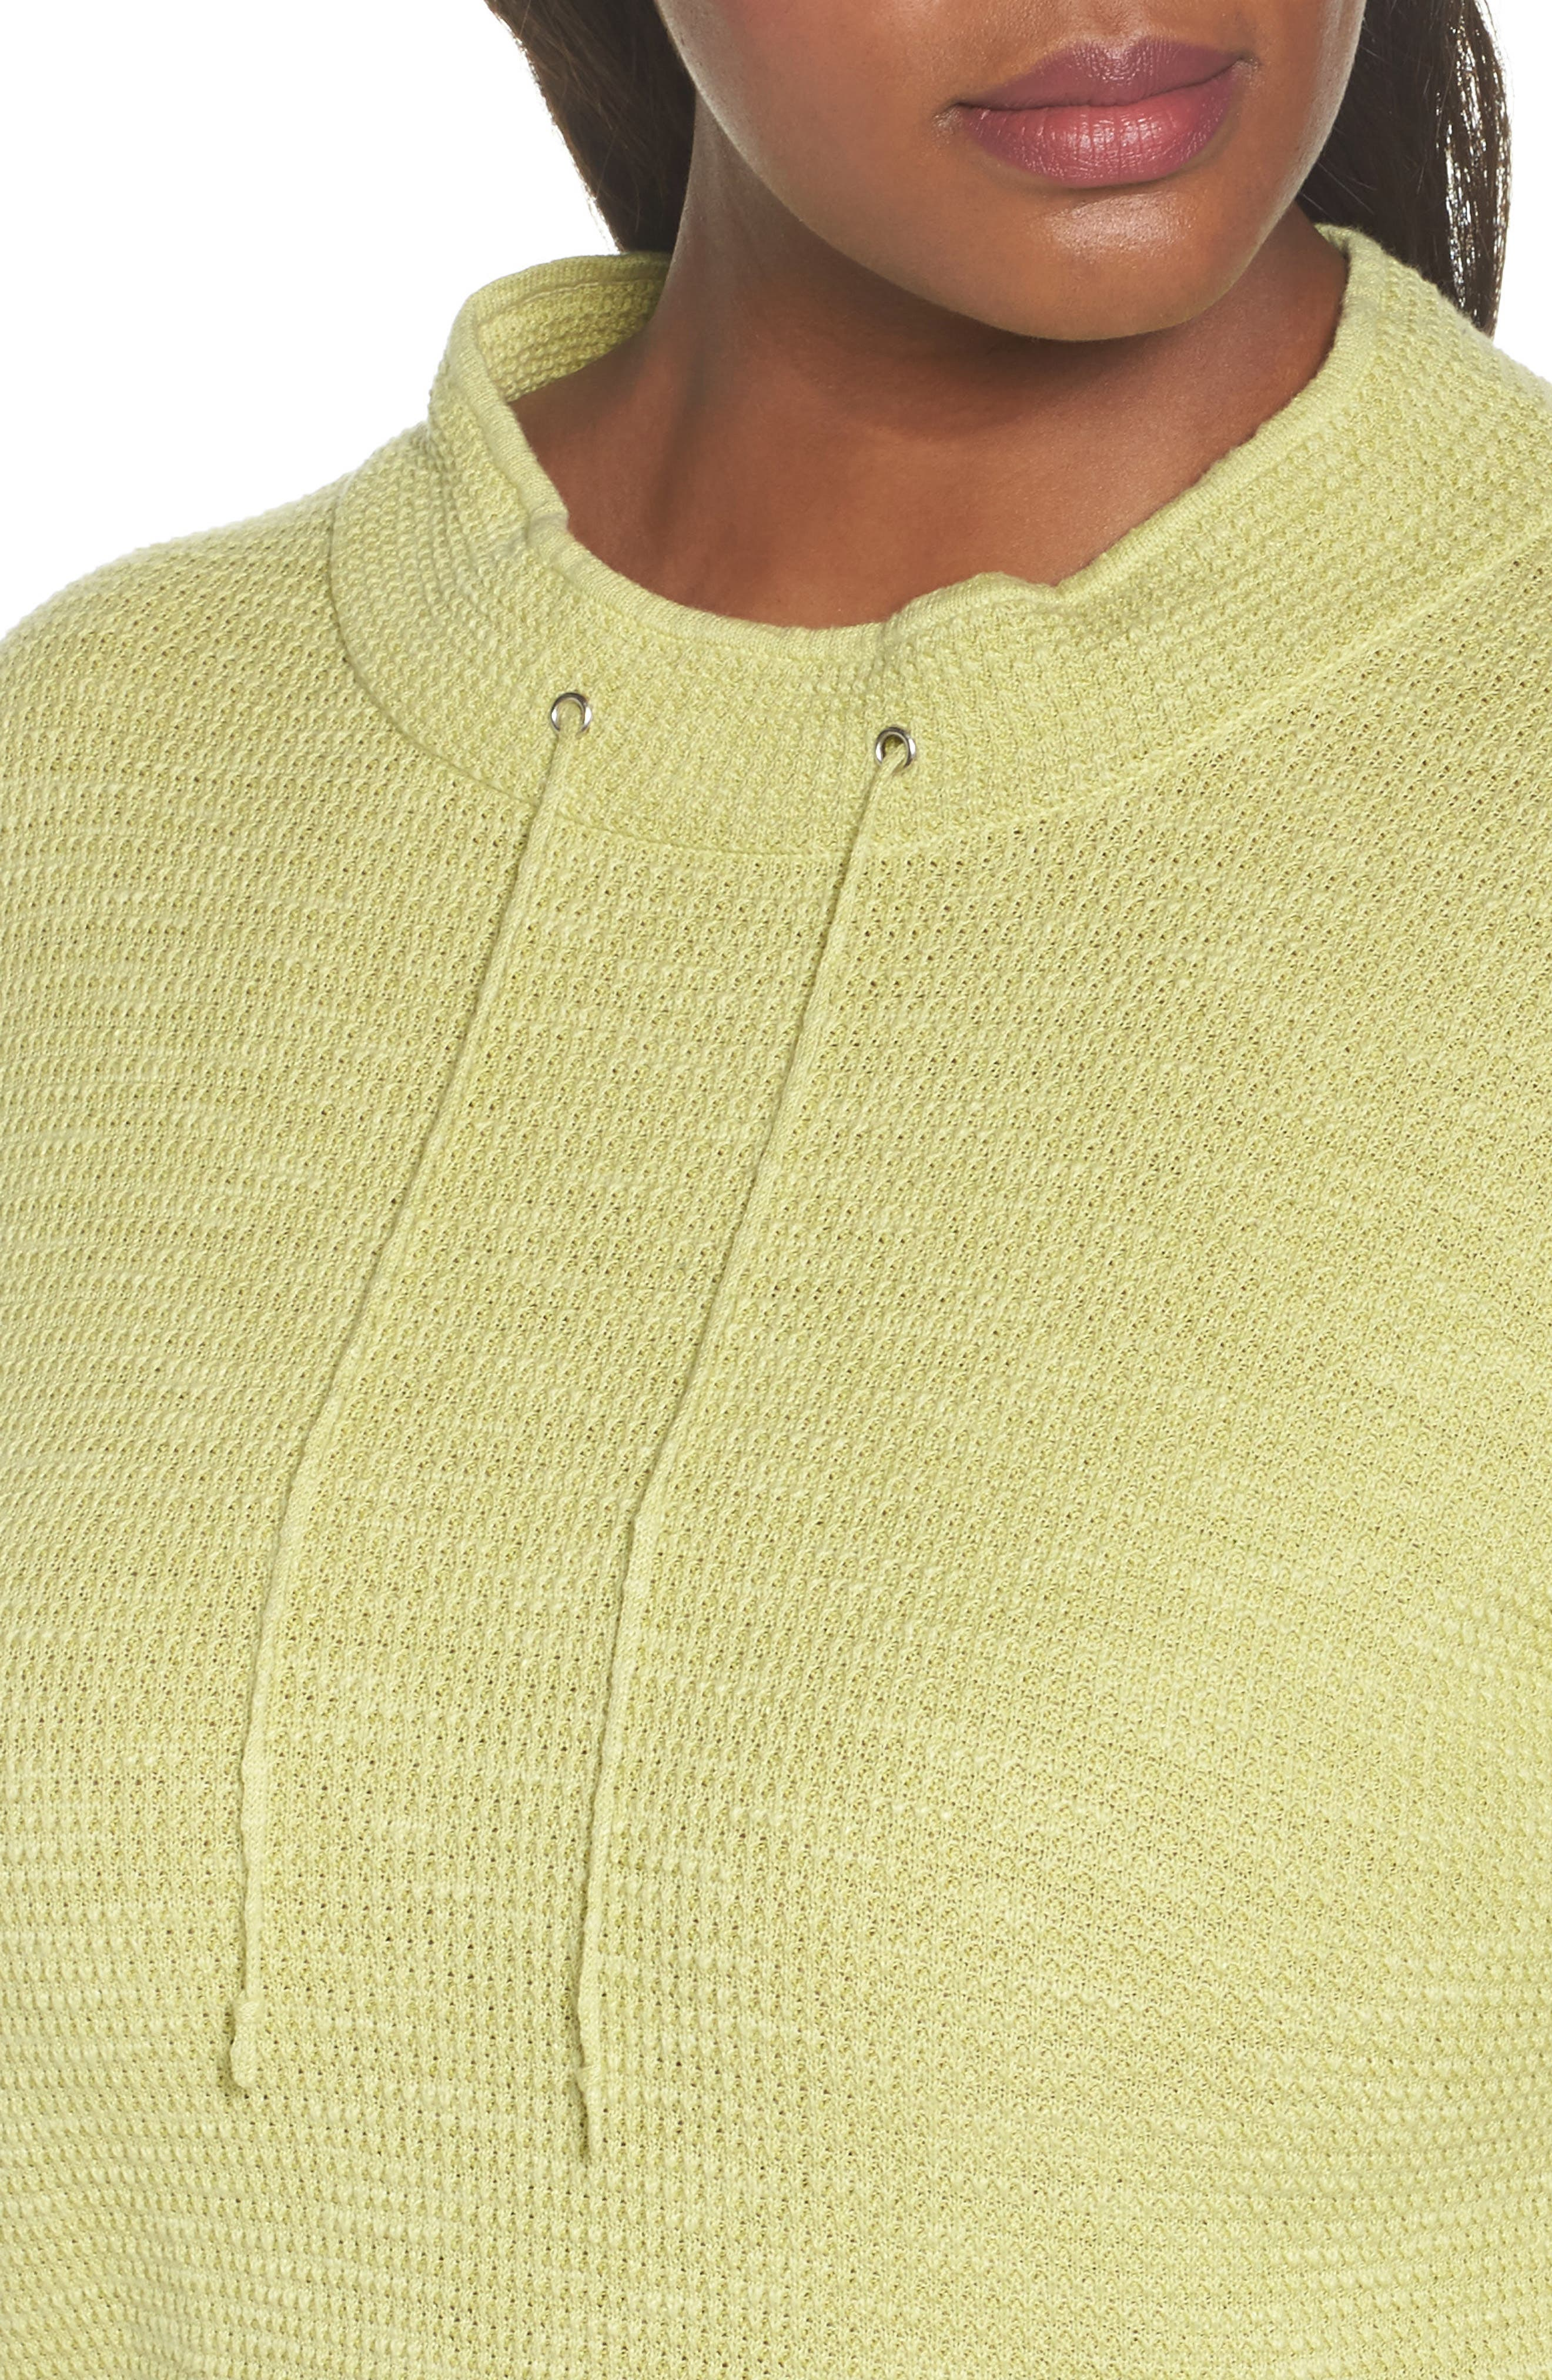 Alternate Image 4  - Eileen Fisher Drawstring Neck Organic Linen & Cotton Top (Plus Size)